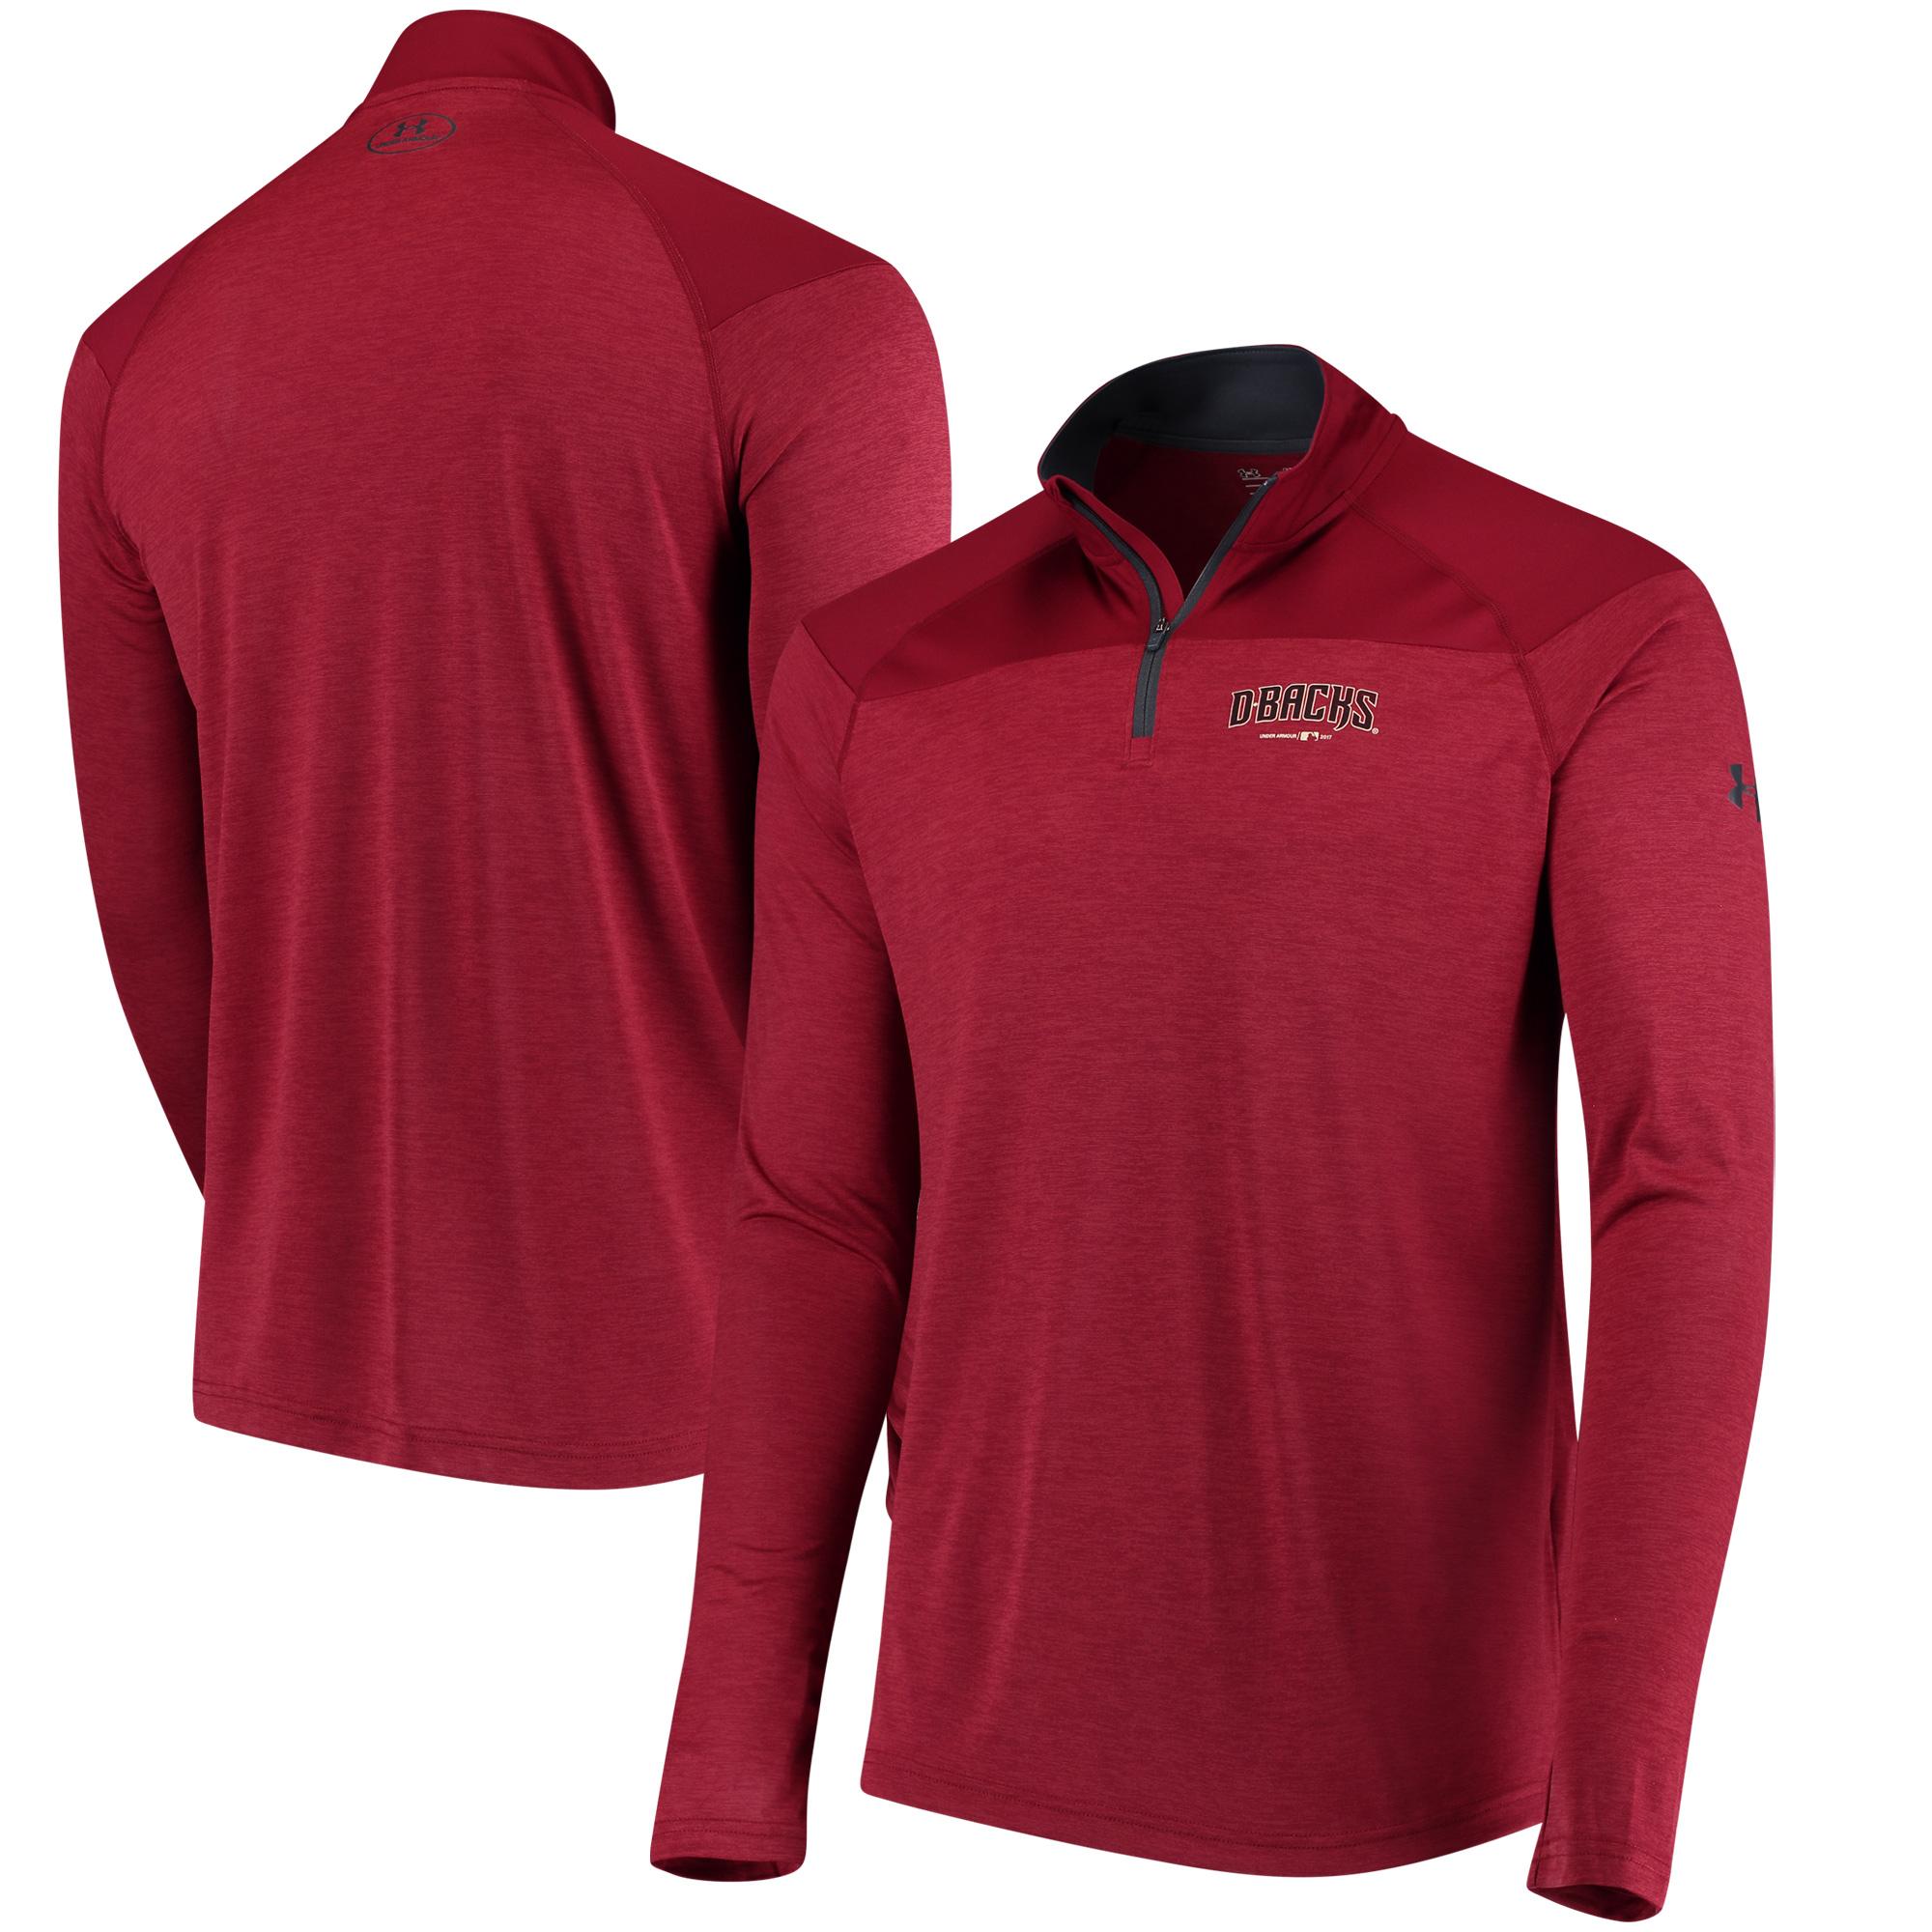 Arizona Diamondbacks Under Armour Tech Tonal Twist Quarter-Zip Pullover Jacket - Red